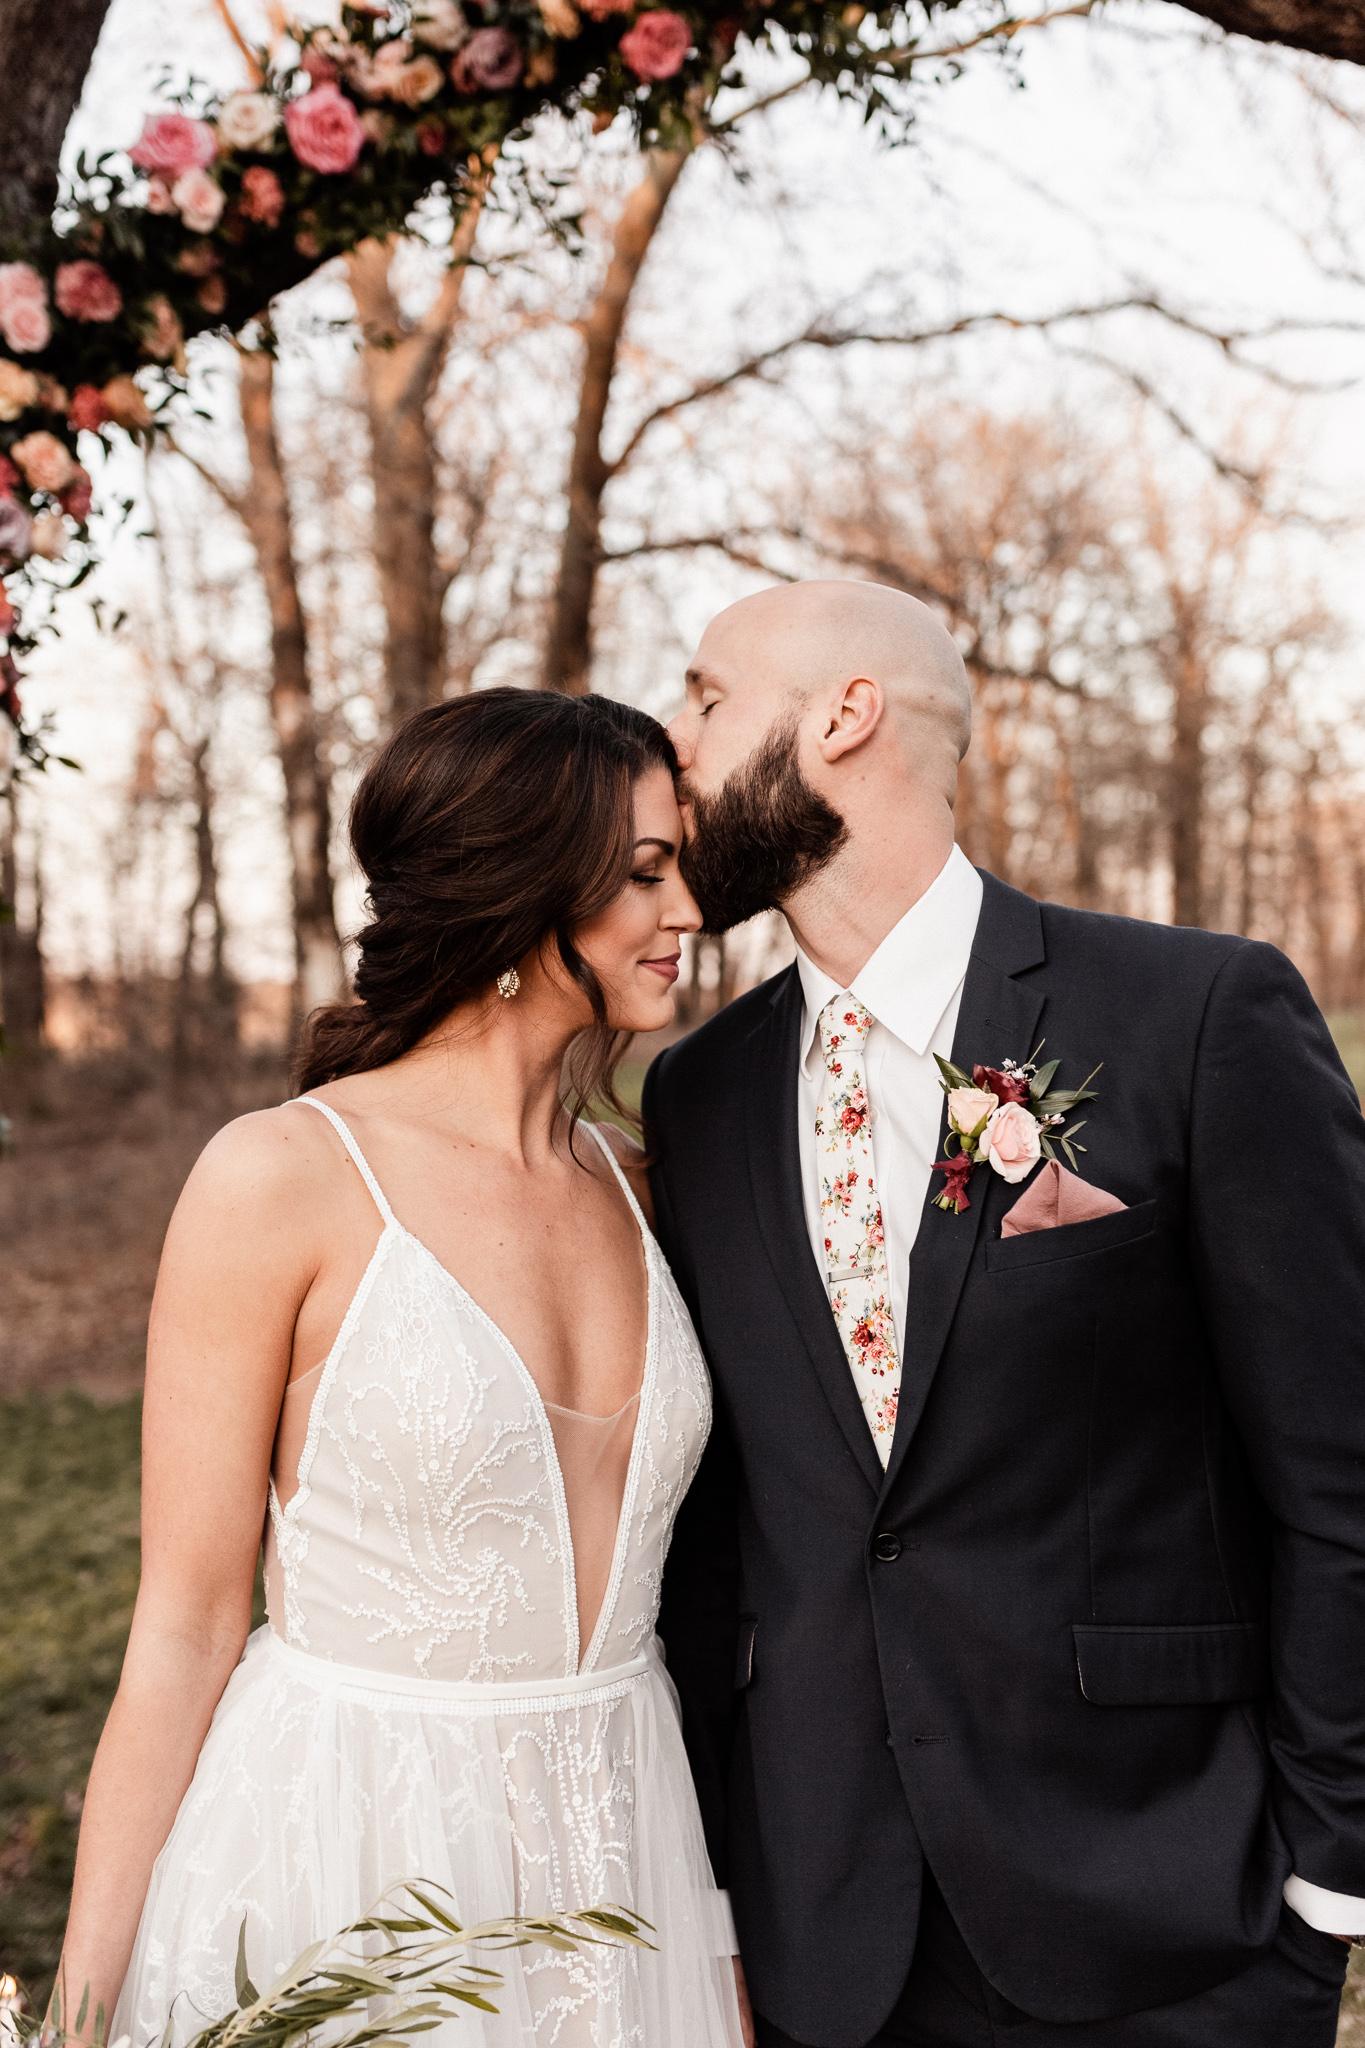 Cultivate Event Planning Styled Shoot   Colorful Romantic Barn Wedding Inspo   Oklahoma Wedding Photographer-102.jpg